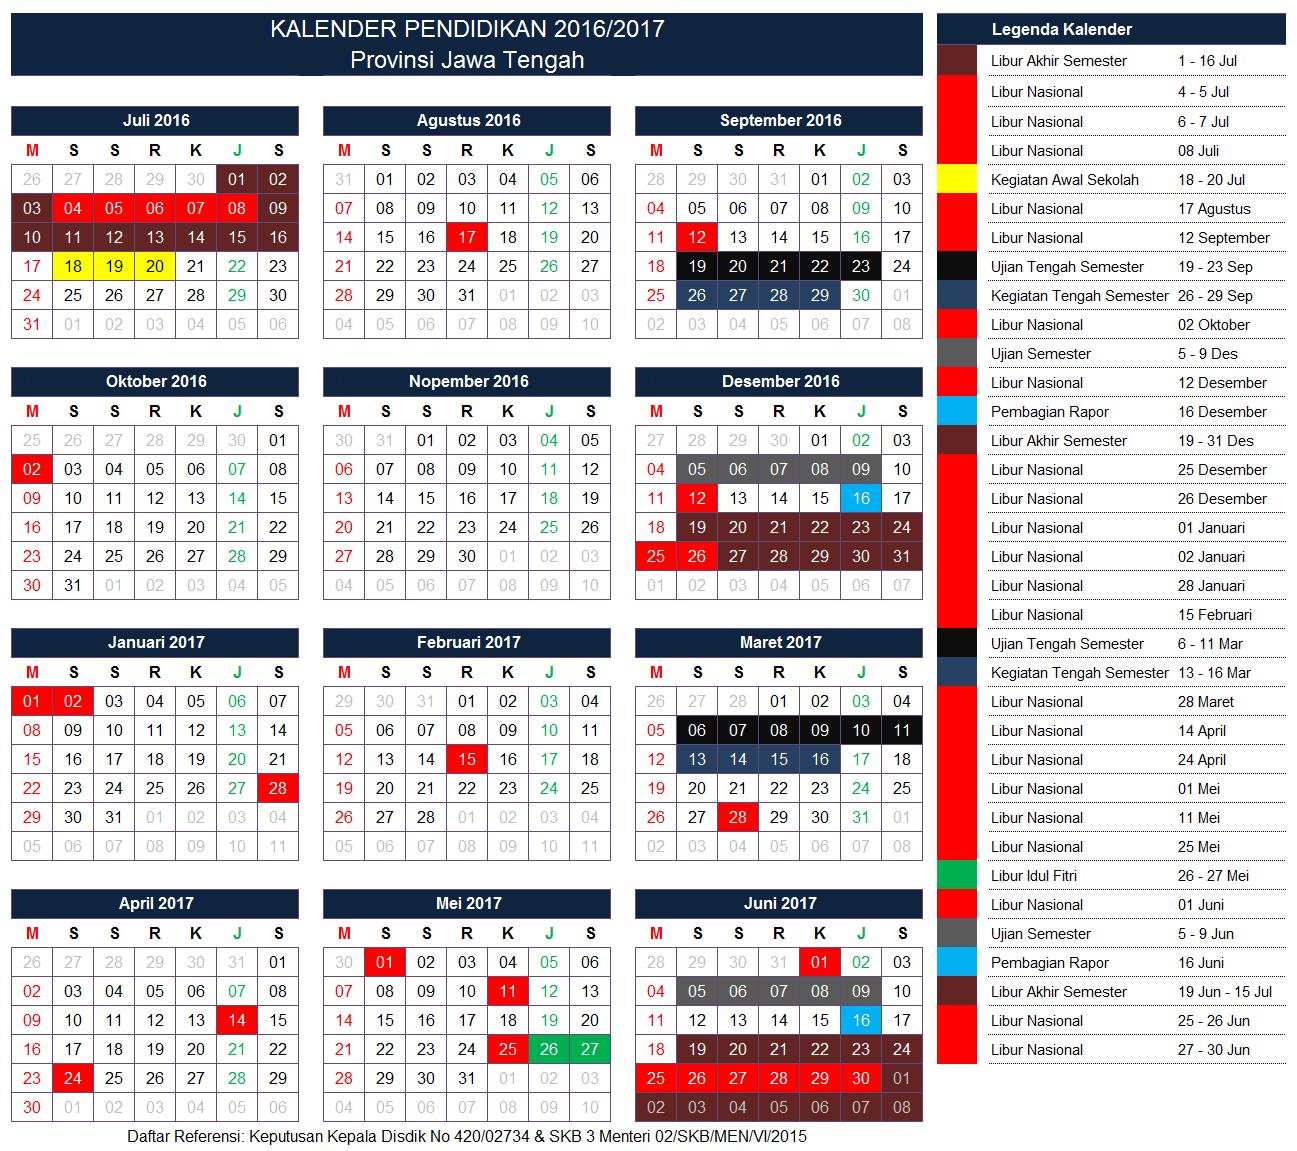 Kalender Pendidikan Provinsi Jawa Tengah